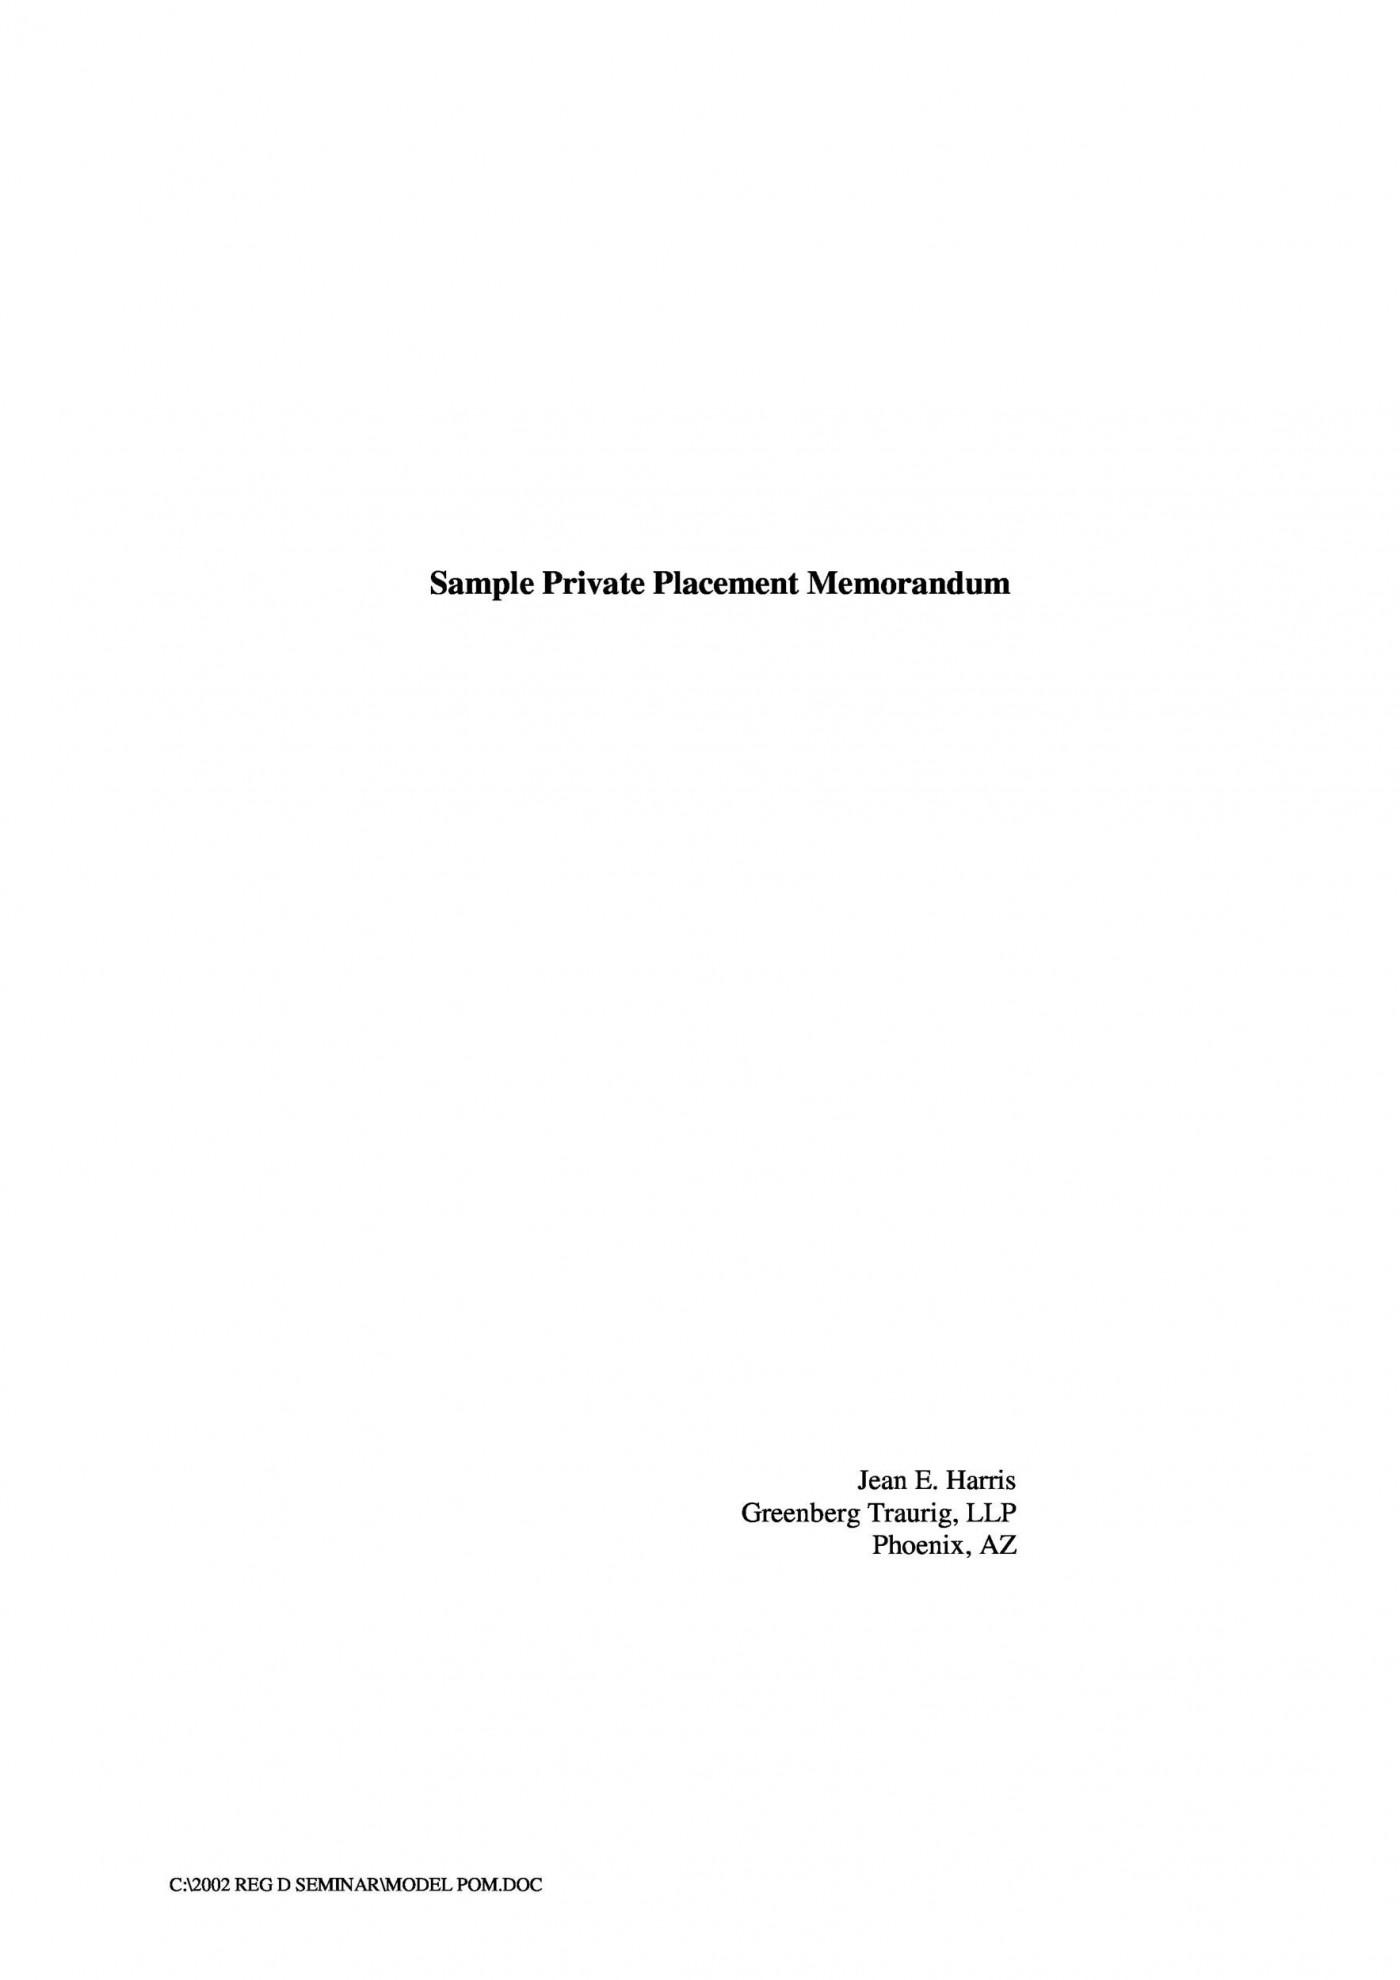 000 Stunning Private Placement Memorandum Template Word Highest Clarity 1400